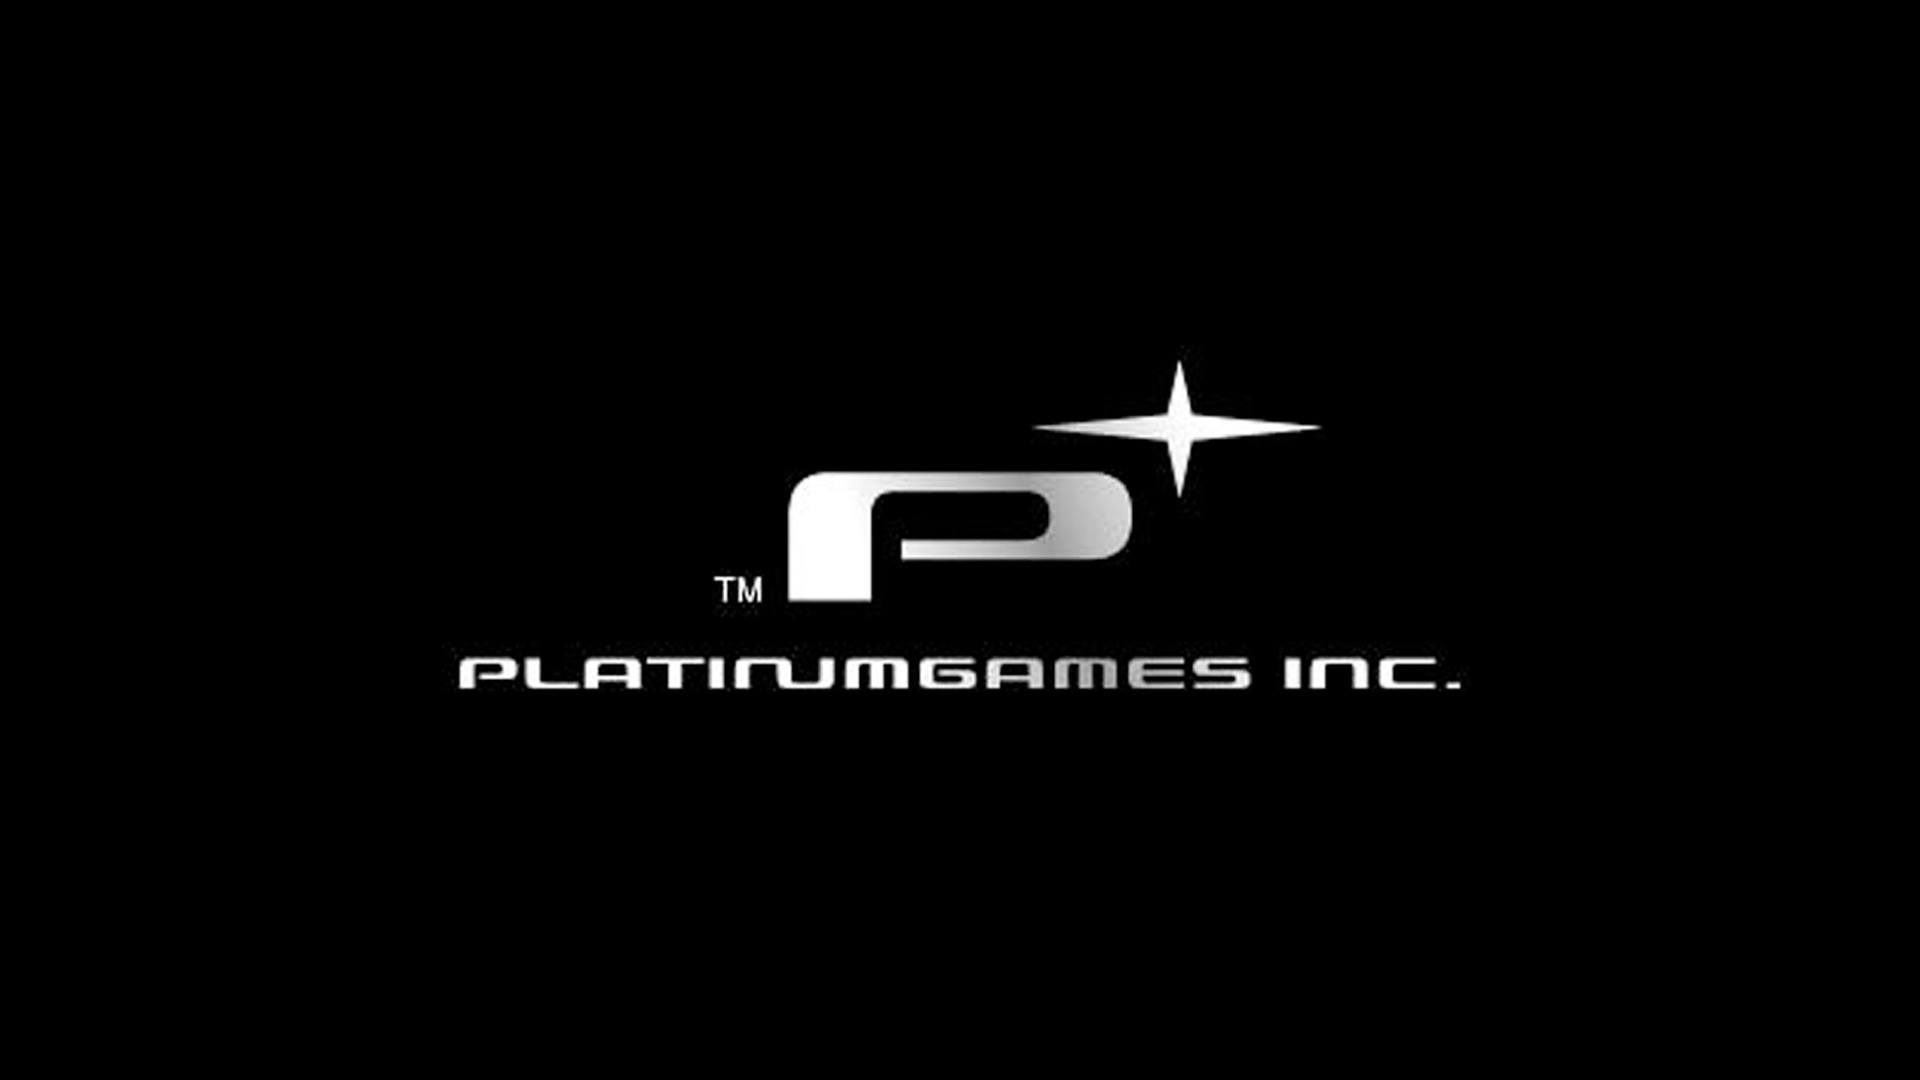 Project GG Platinum Games